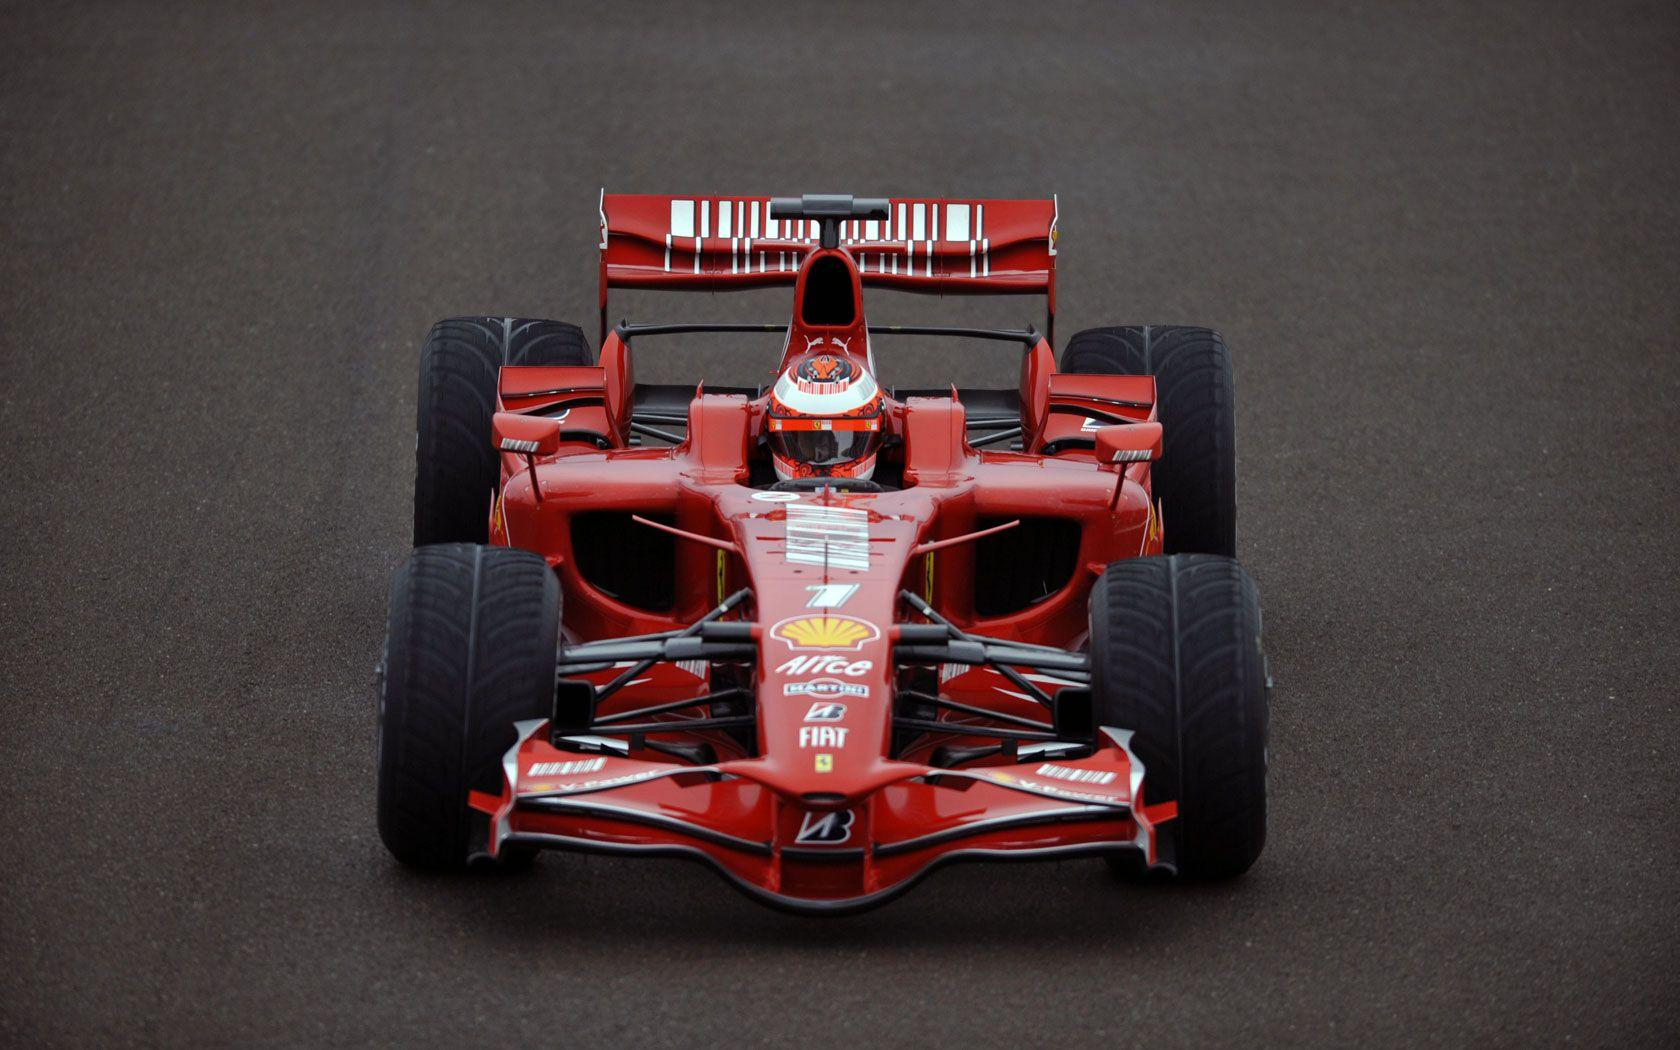 Scuderia Ferrari Wallpapers - Wallpaper Cave